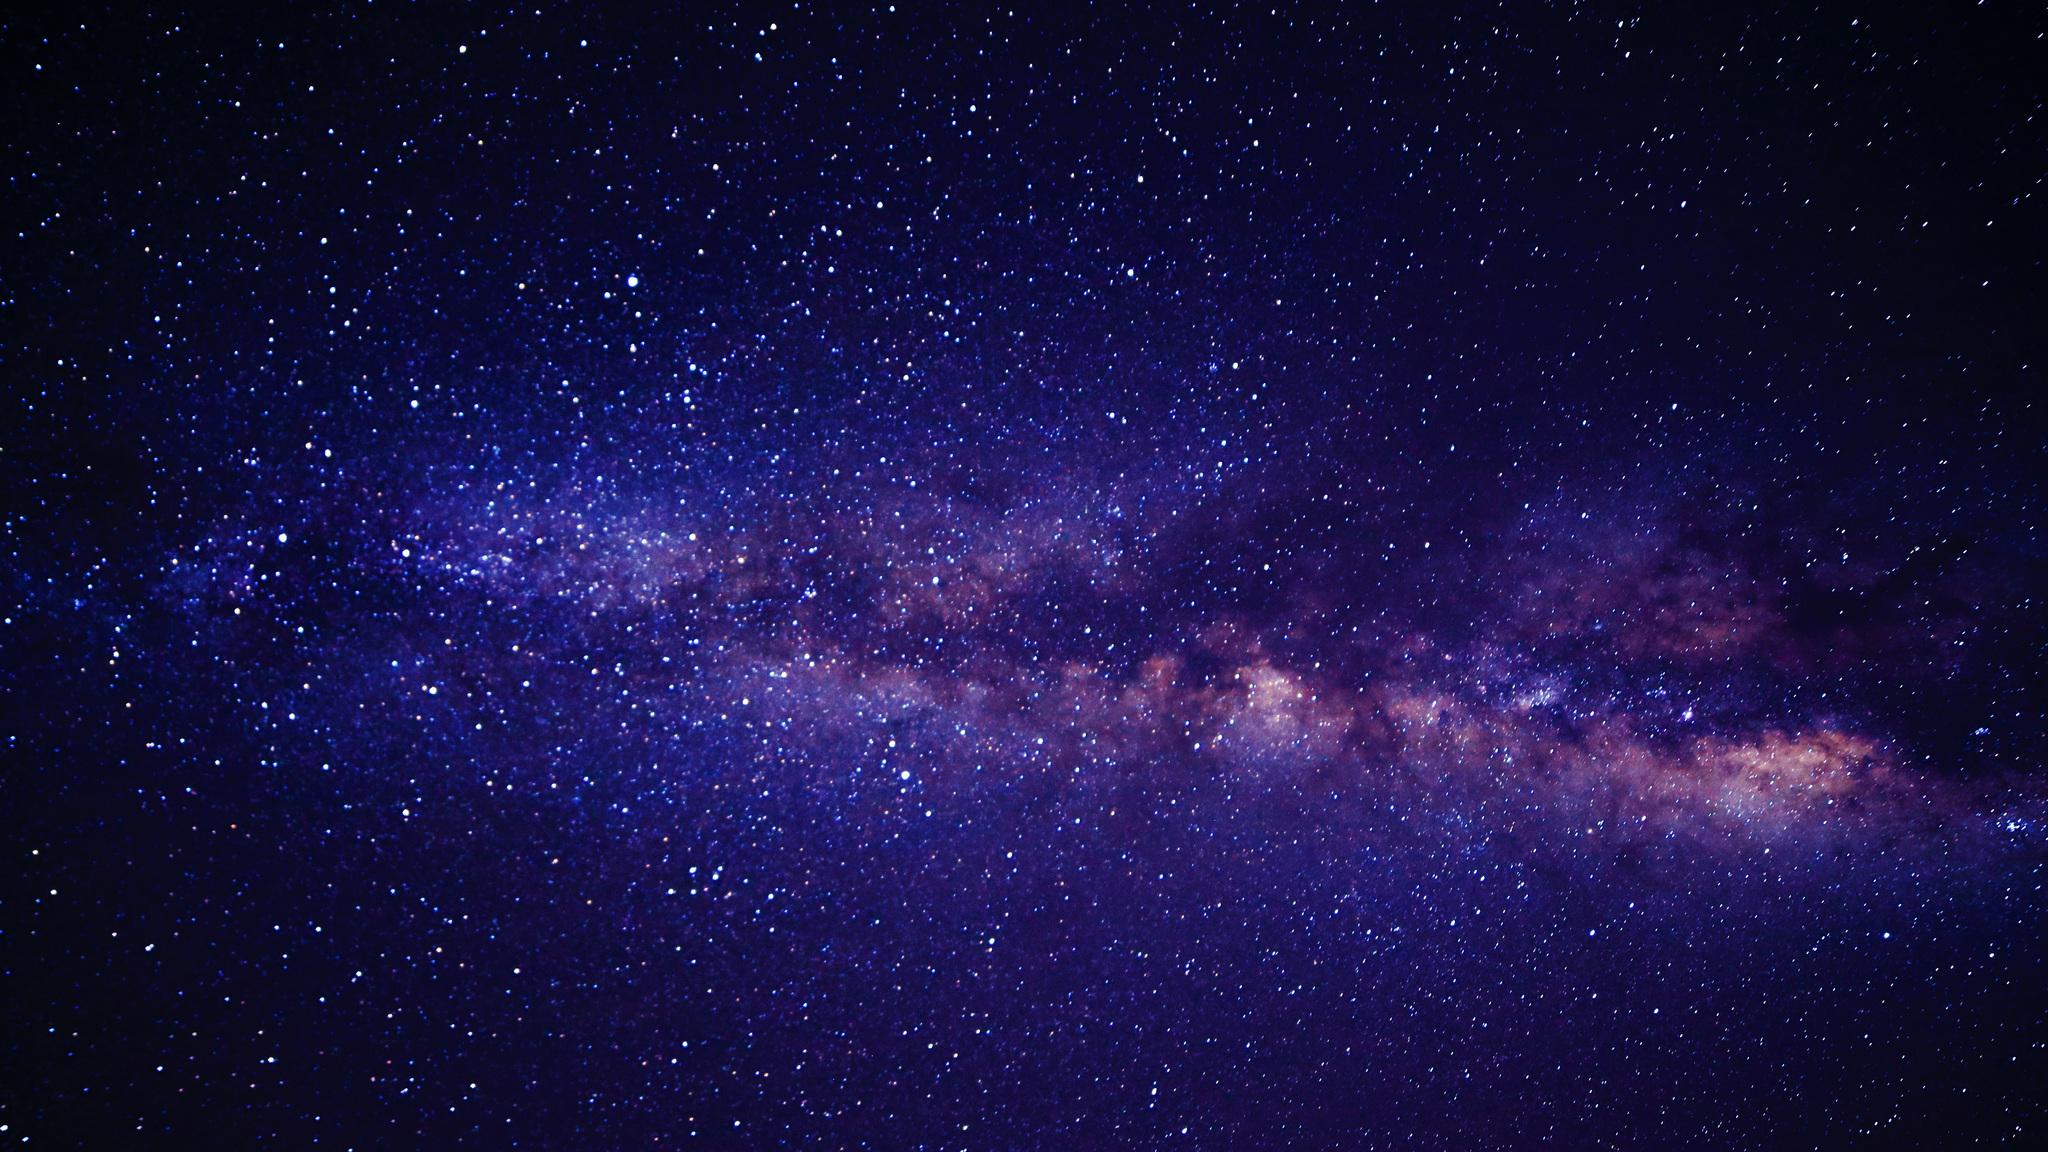 2048x1152 Andromeda Galaxy Way 2048x1152 Resolution Hd 4k